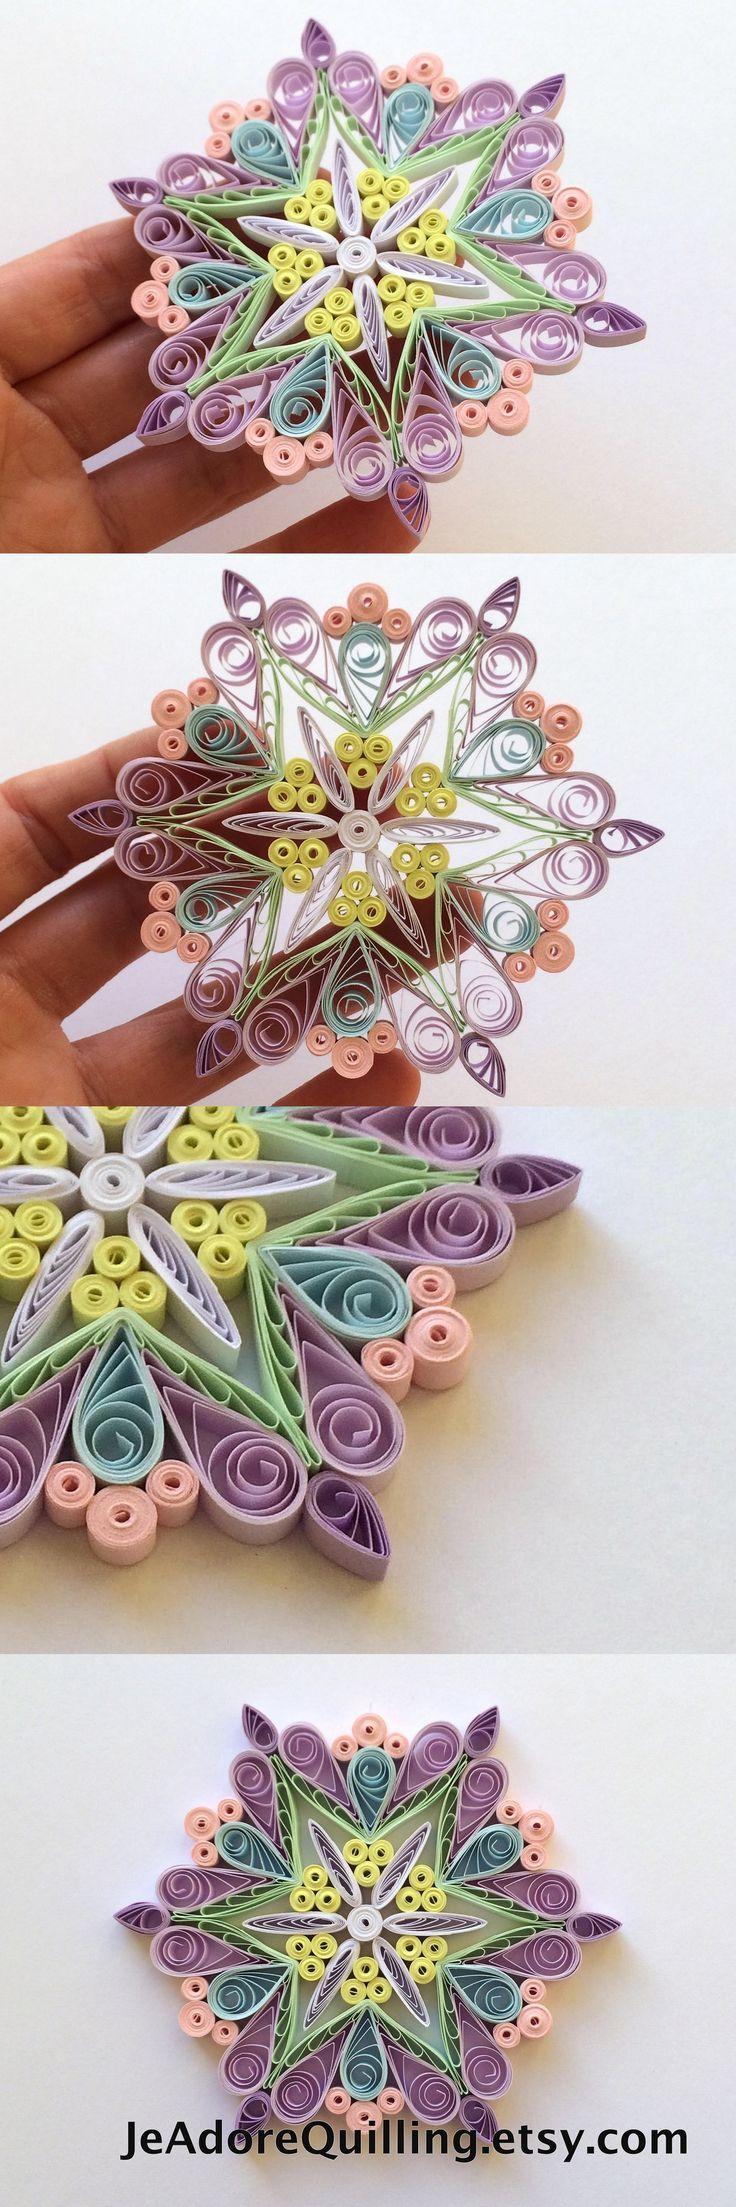 Corporate Gifts Ideas     Corporate Gifts Ideas     Snowflake Candy Purple Yello...